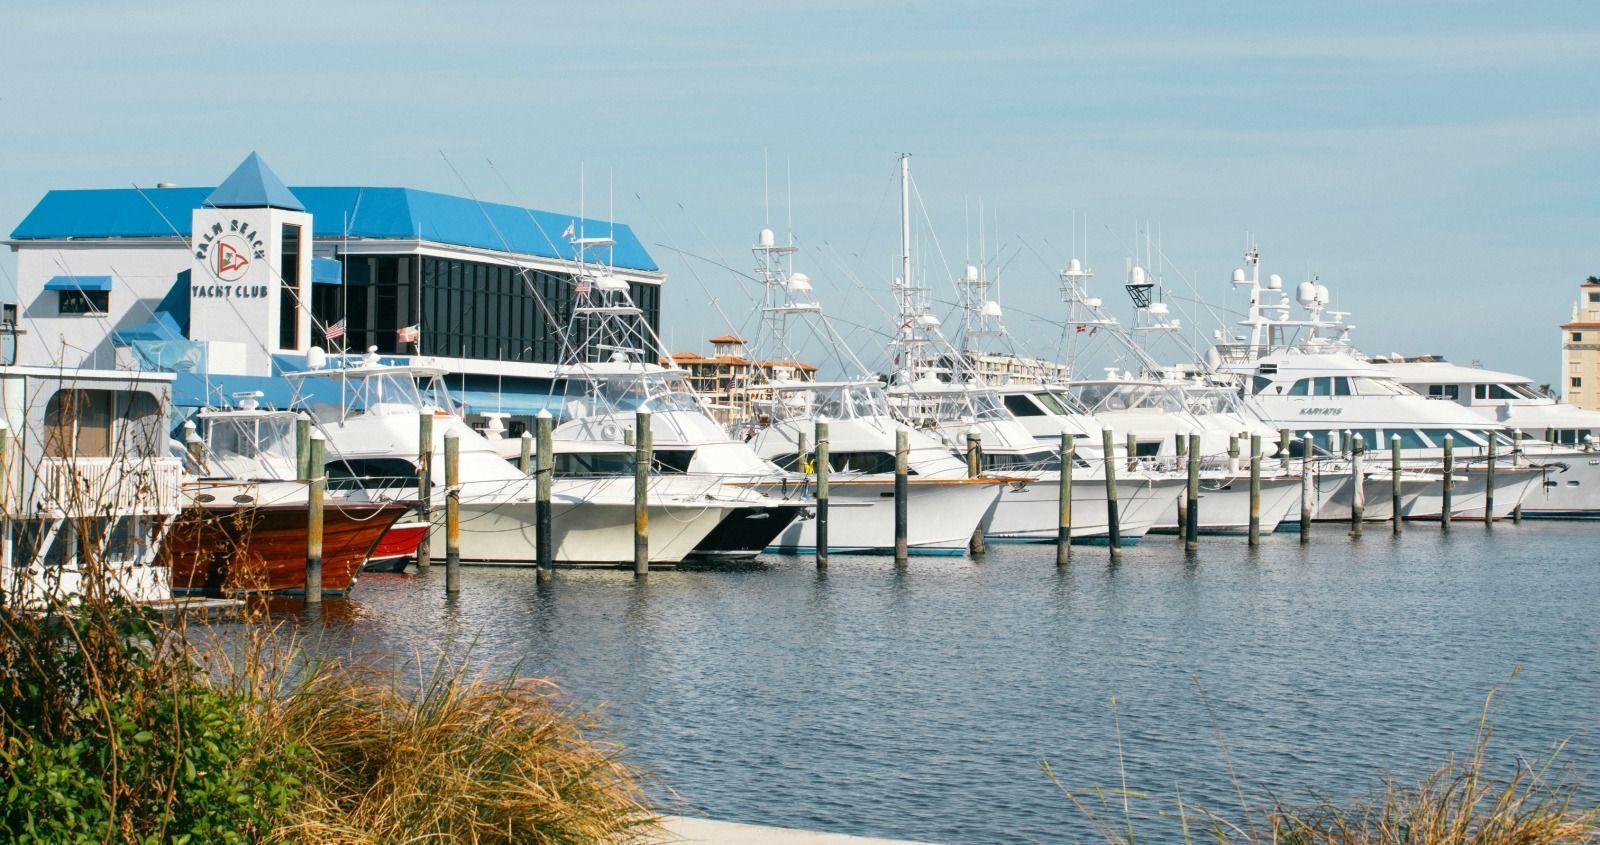 Palm Beach Yacht Club & Marina in West Palm Beach, FL